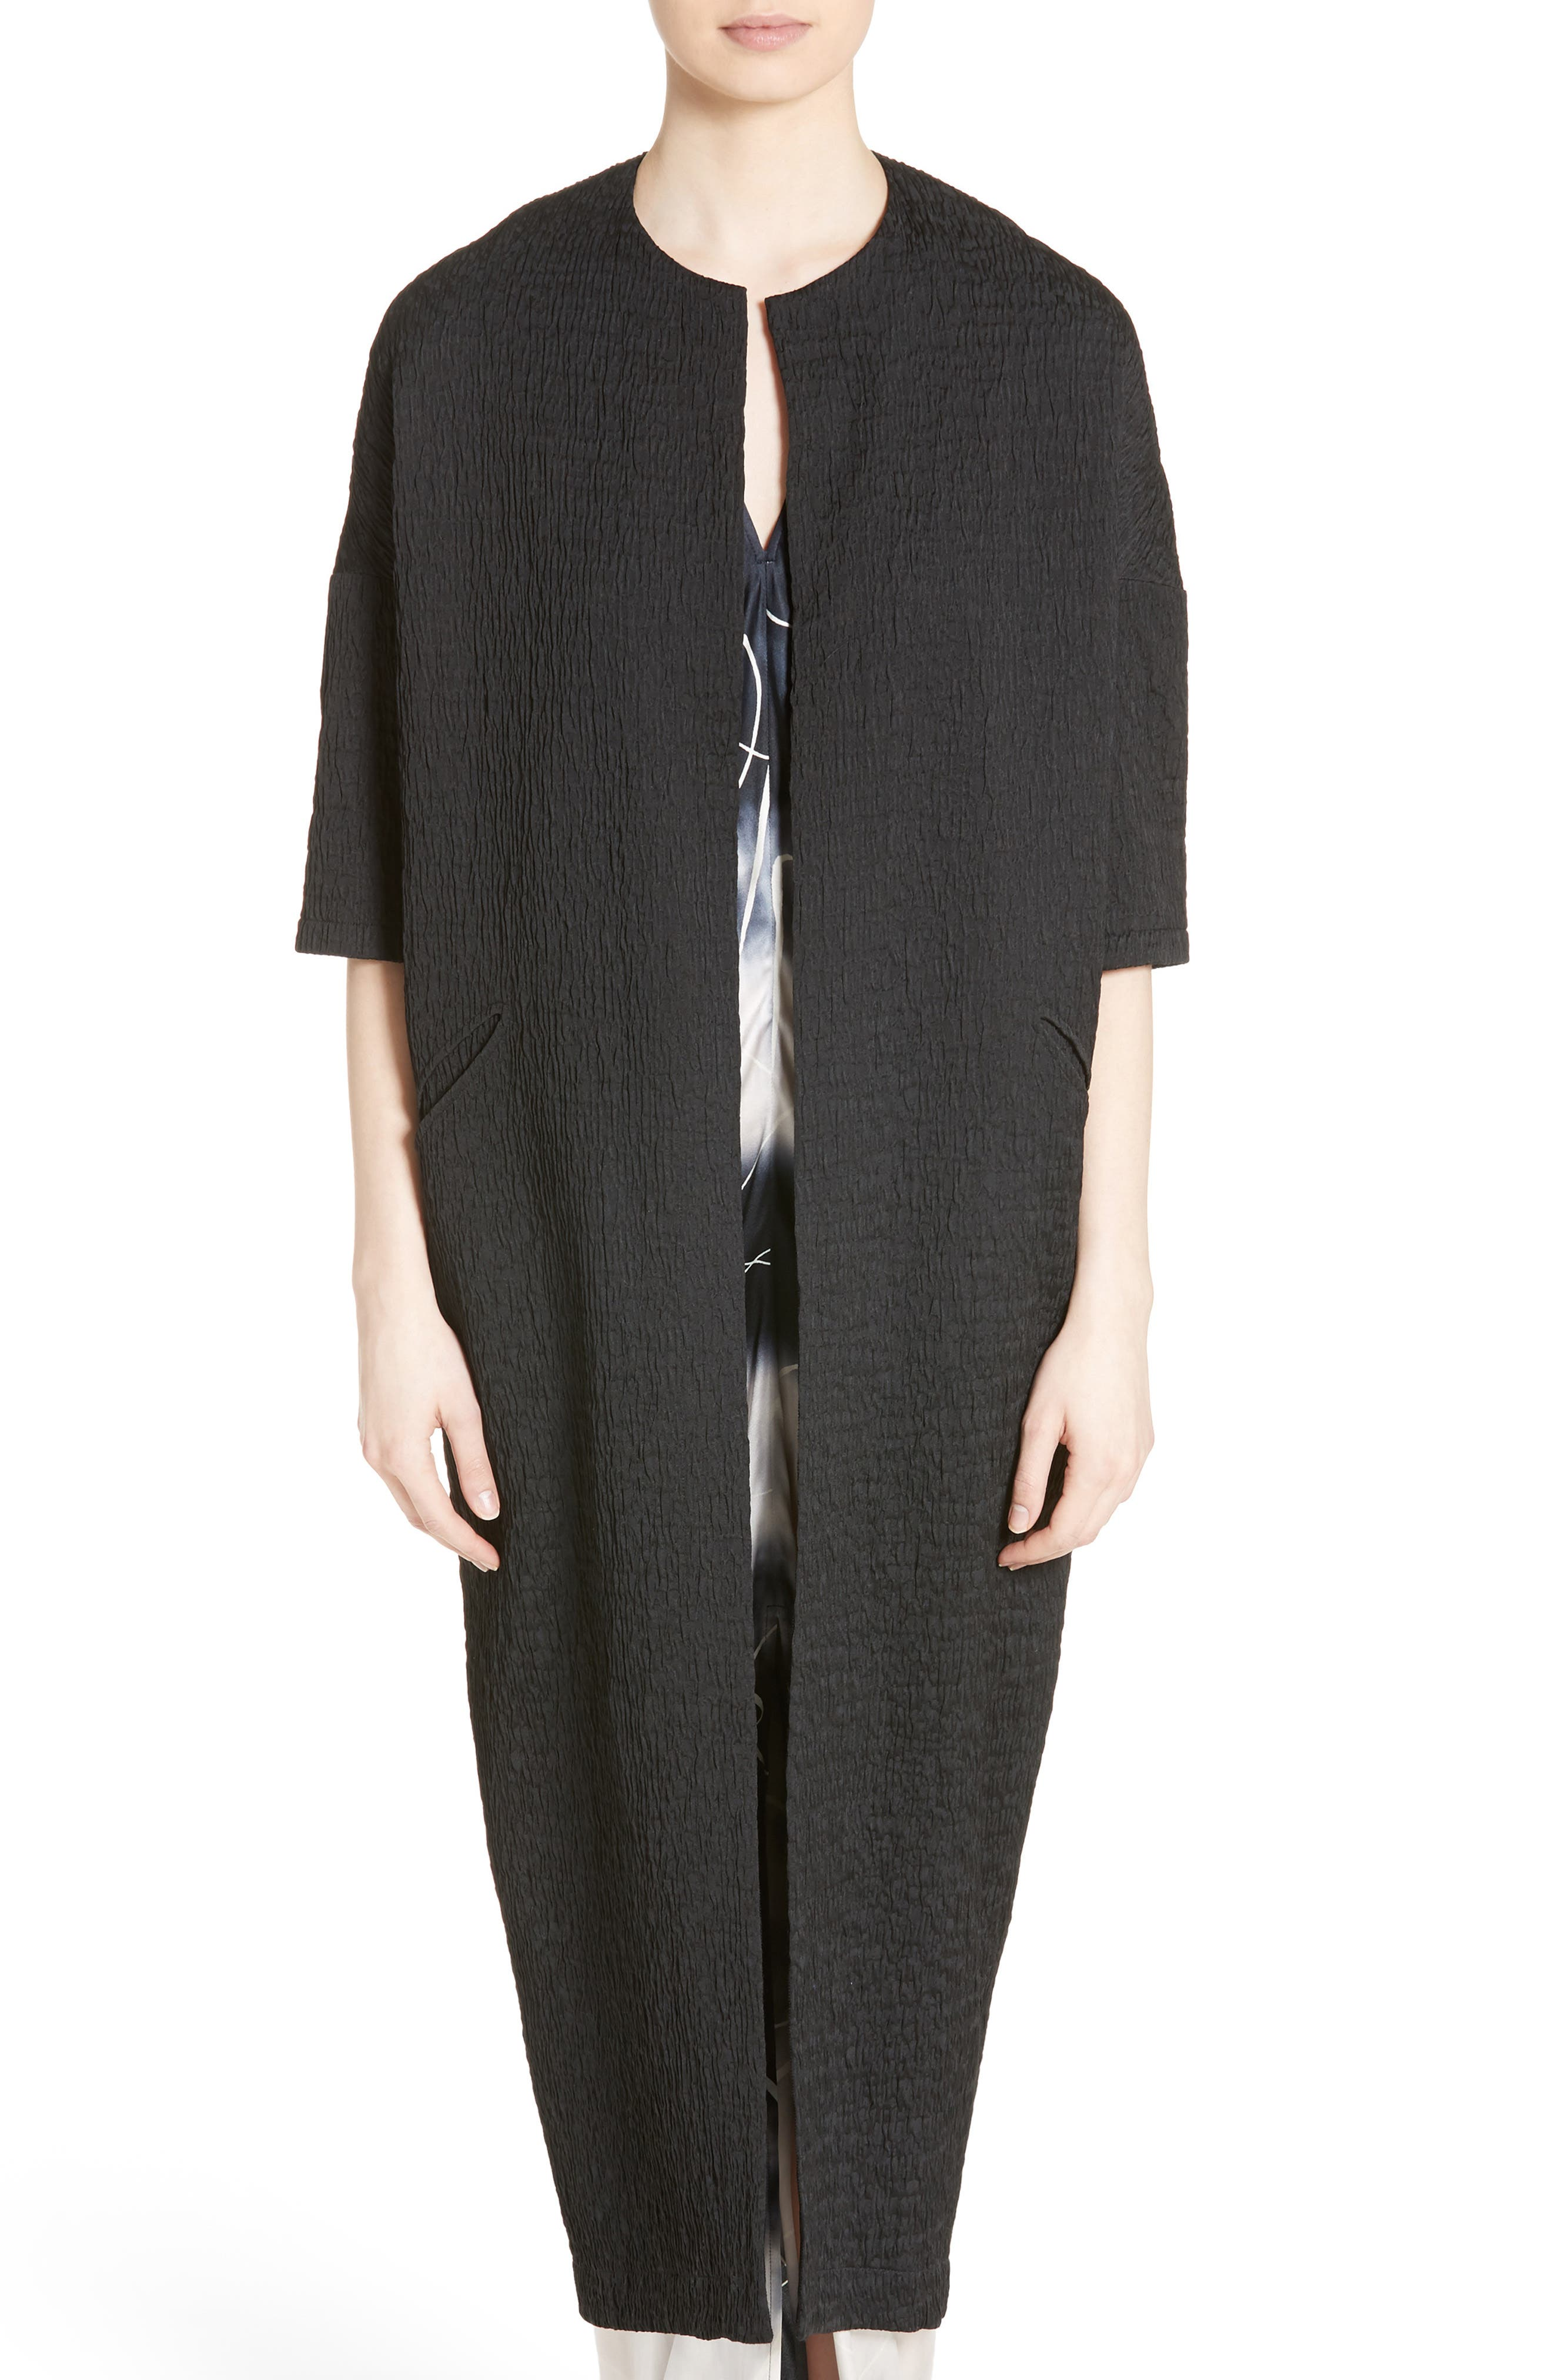 Koya Crinkle Stretch Coat,                         Main,                         color, 001